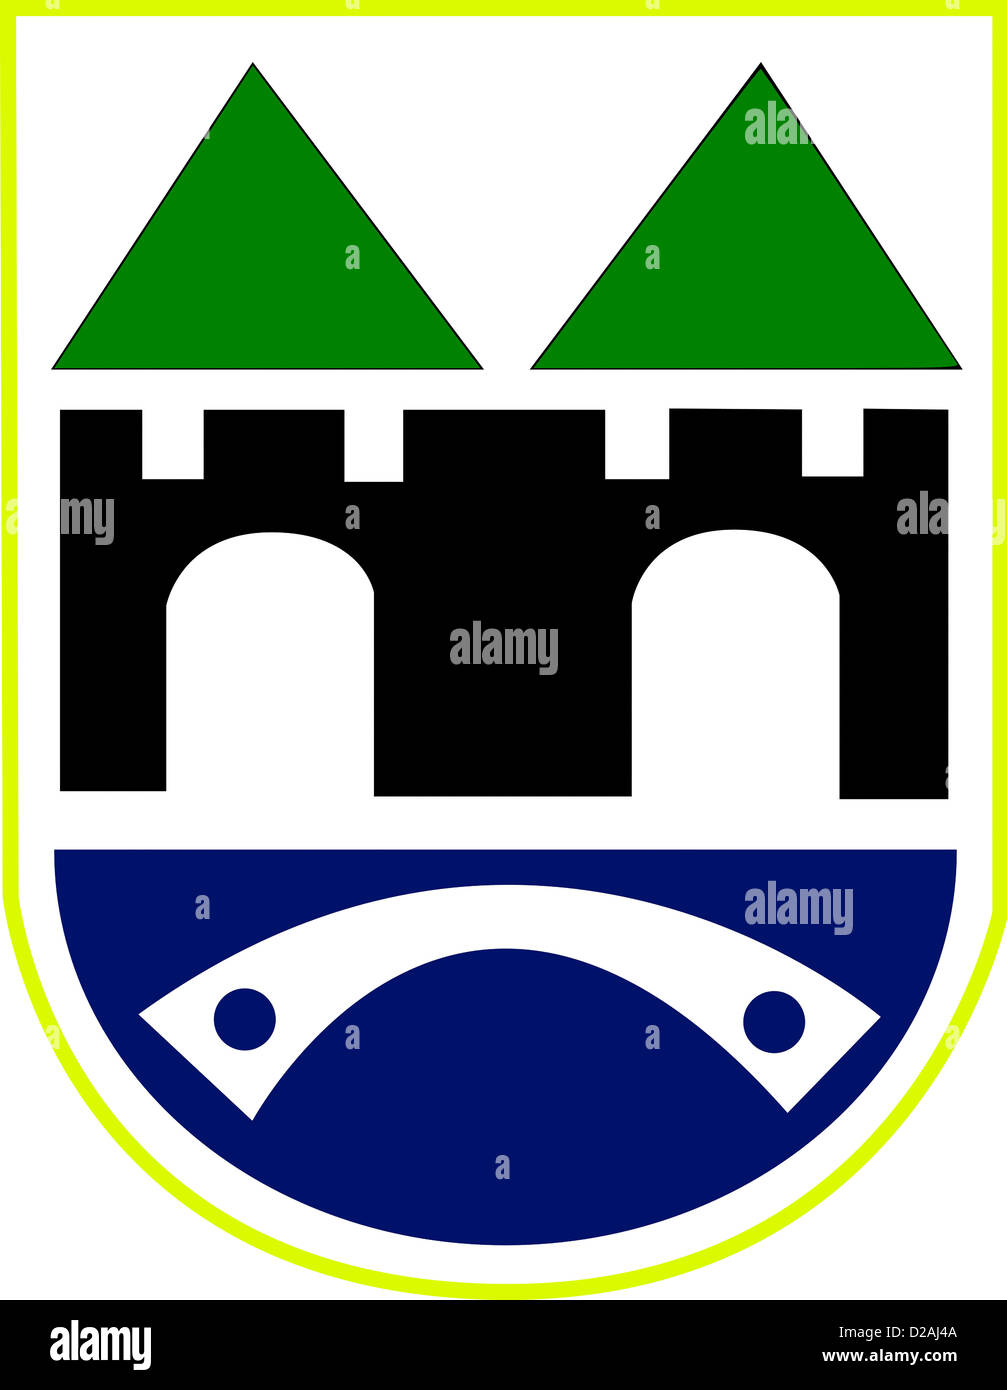 Coat of arms of Sarajevo - Capital city of Bosnia and Herzegovina. - Stock Image